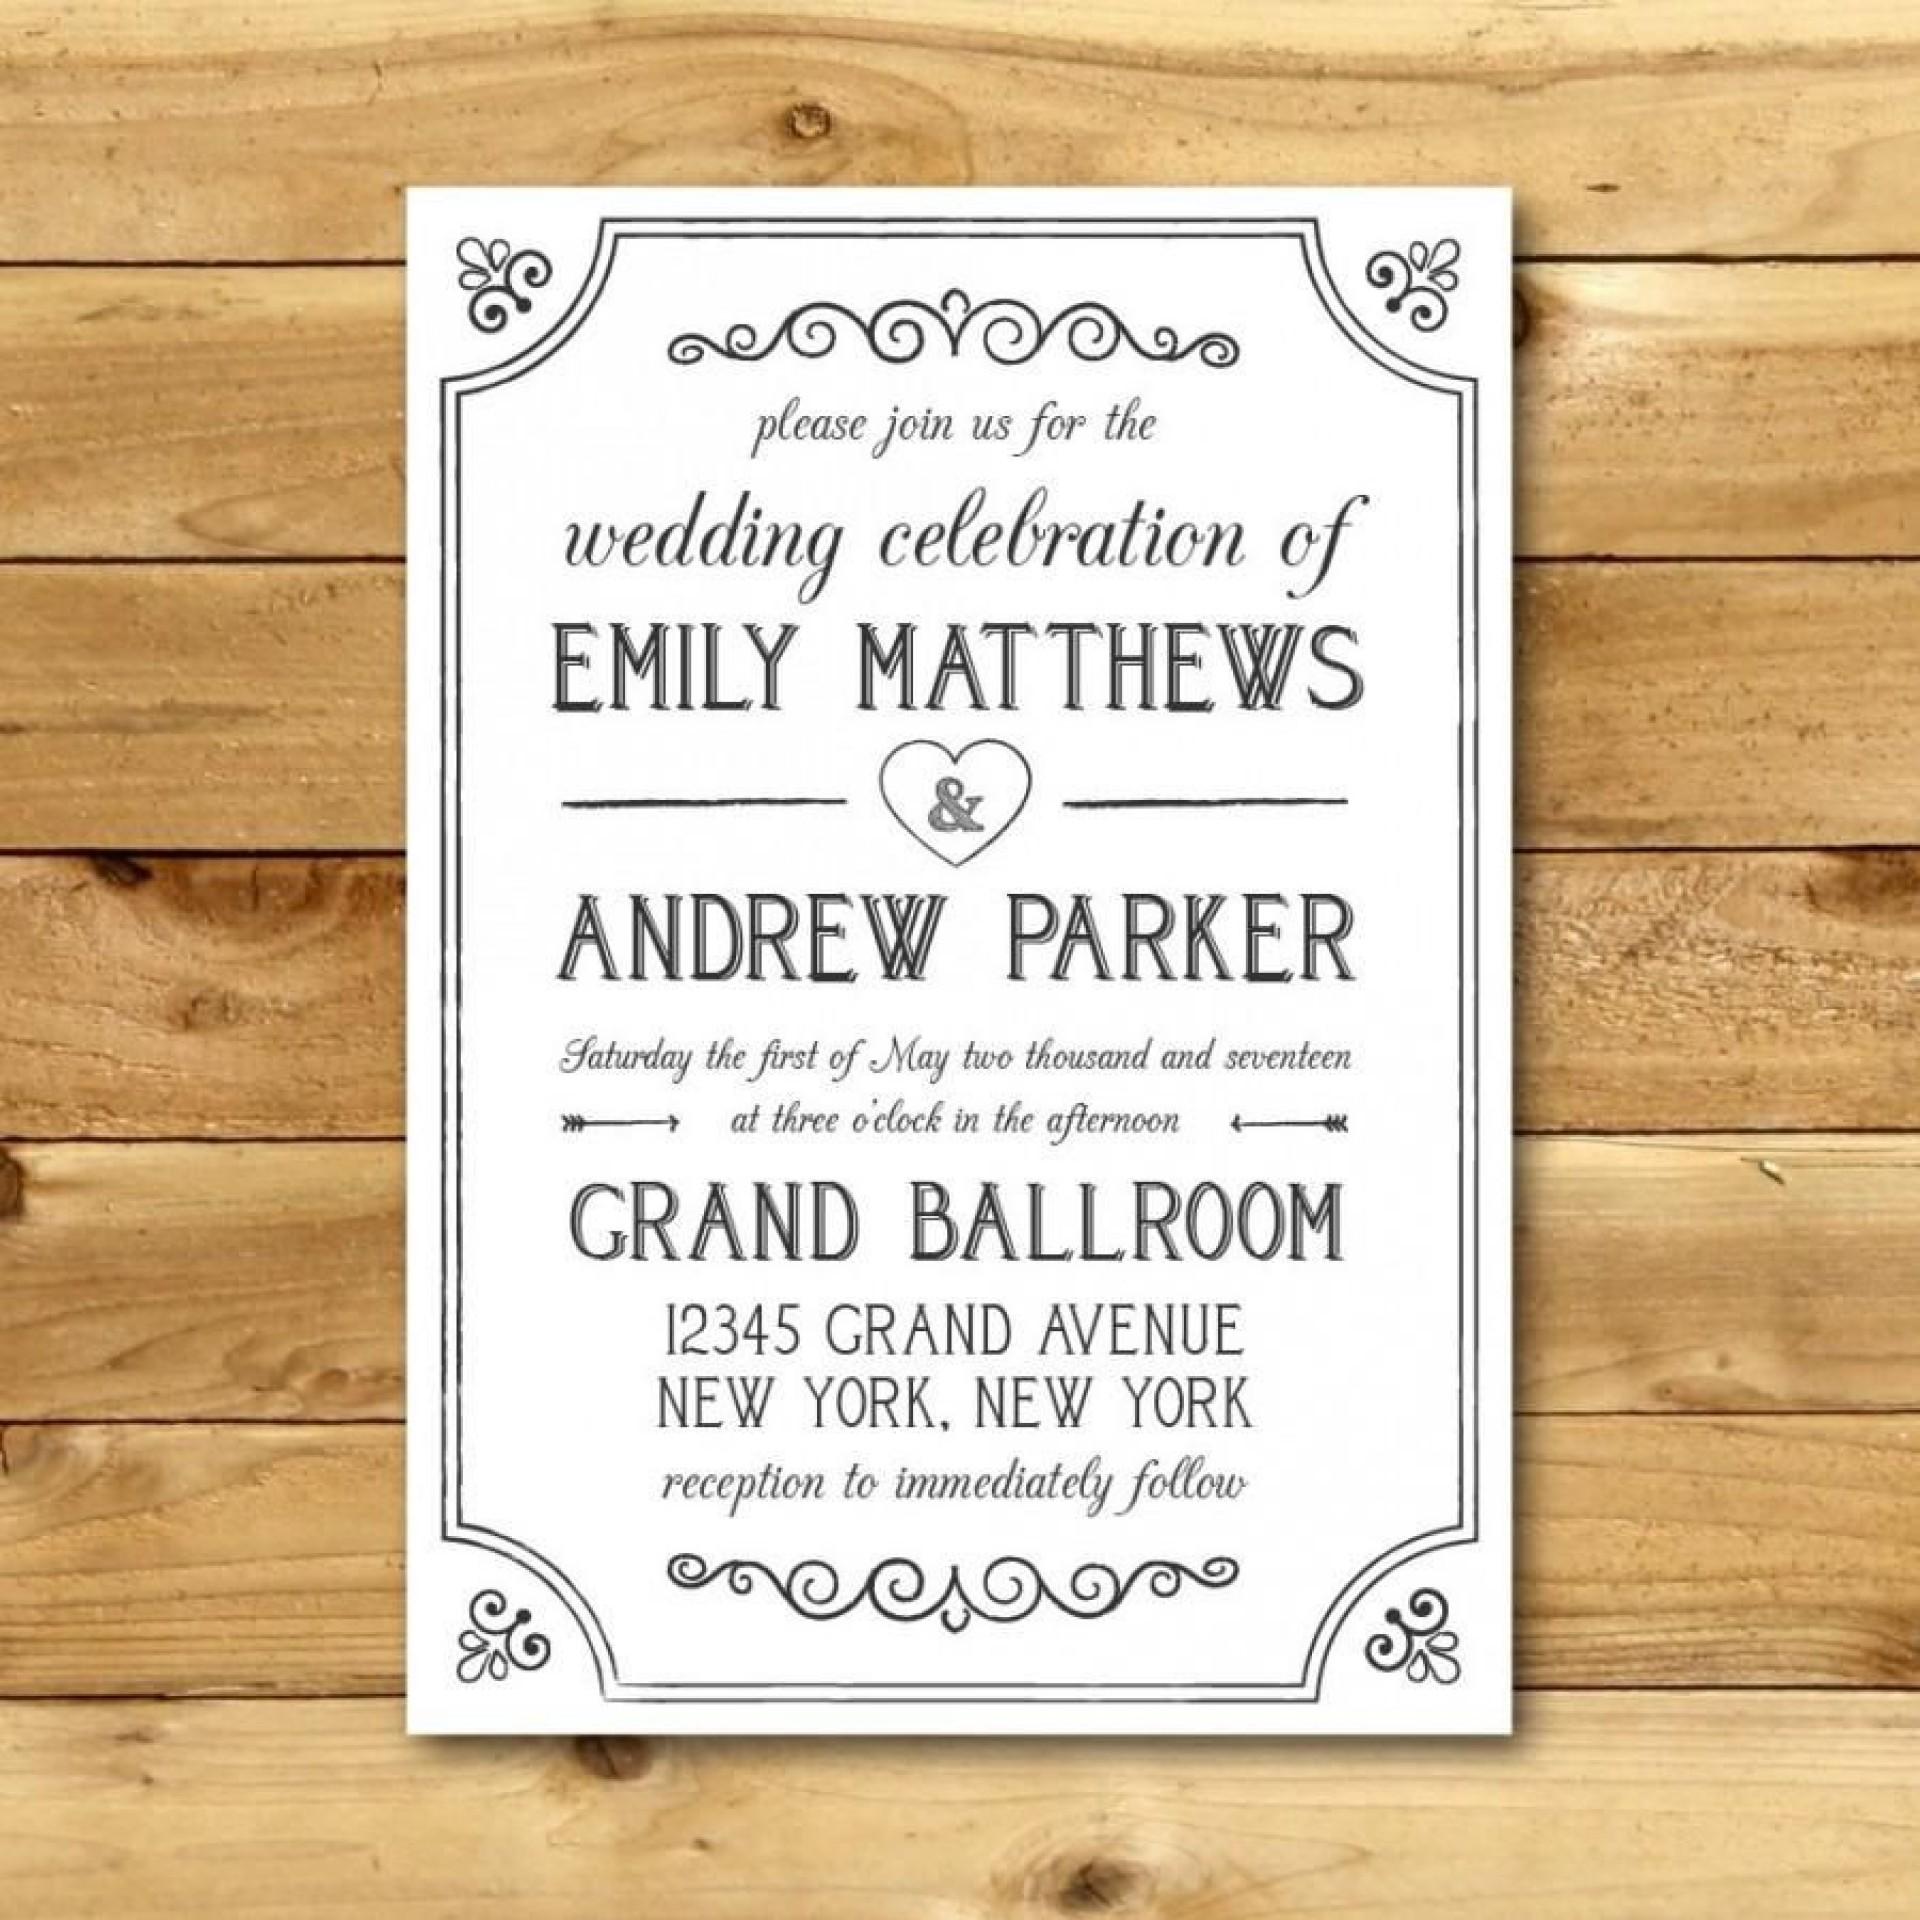 010 Stunning M Word Invitation Template Image  Microsoft Card Wedding Free Download Editable1920